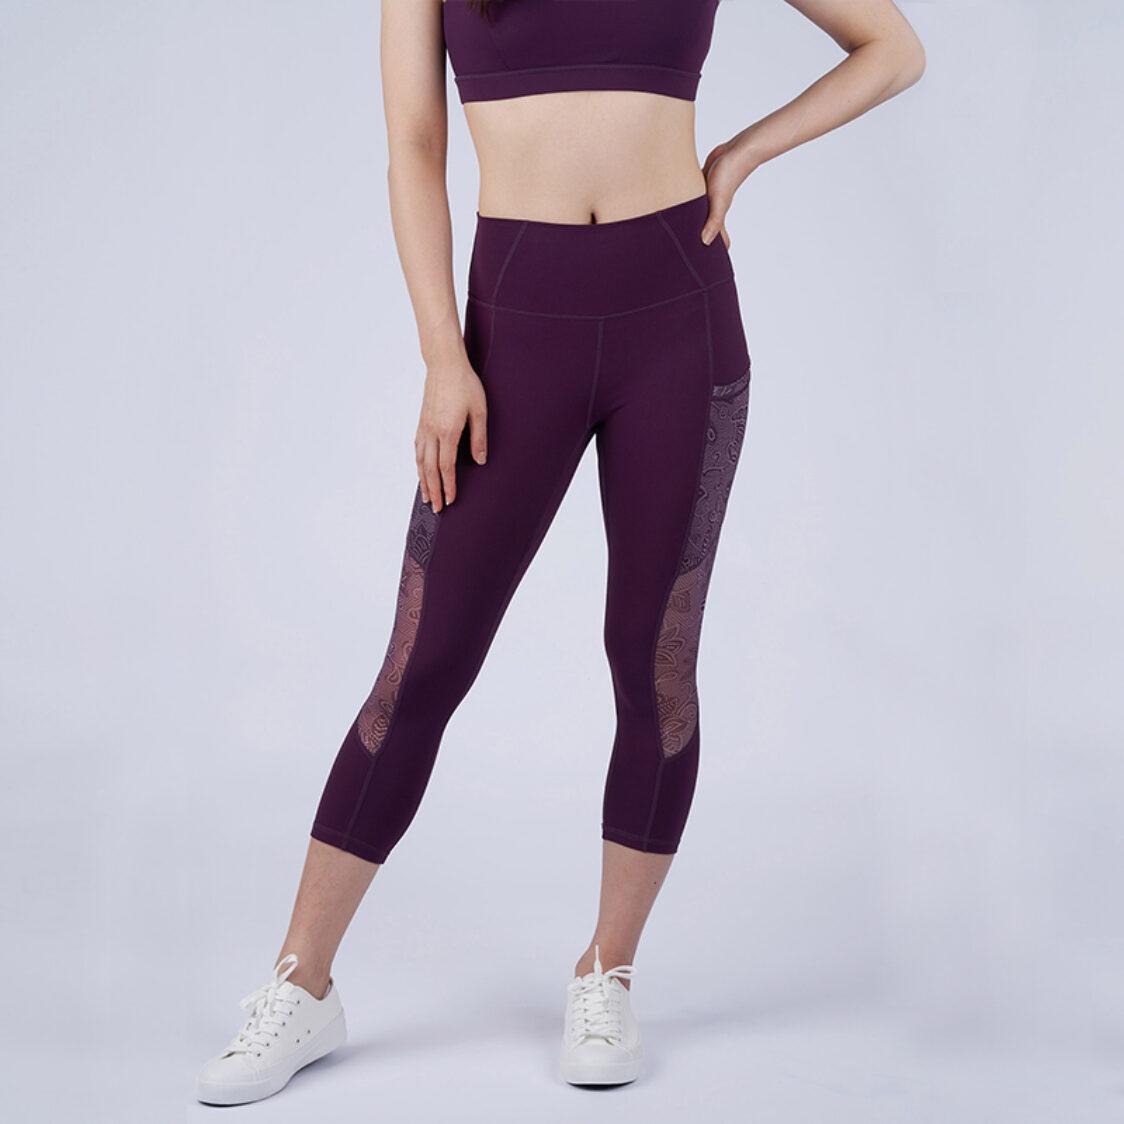 Yumi Active Yuga Mesh Capri Sarong Kebaya Plum Purple